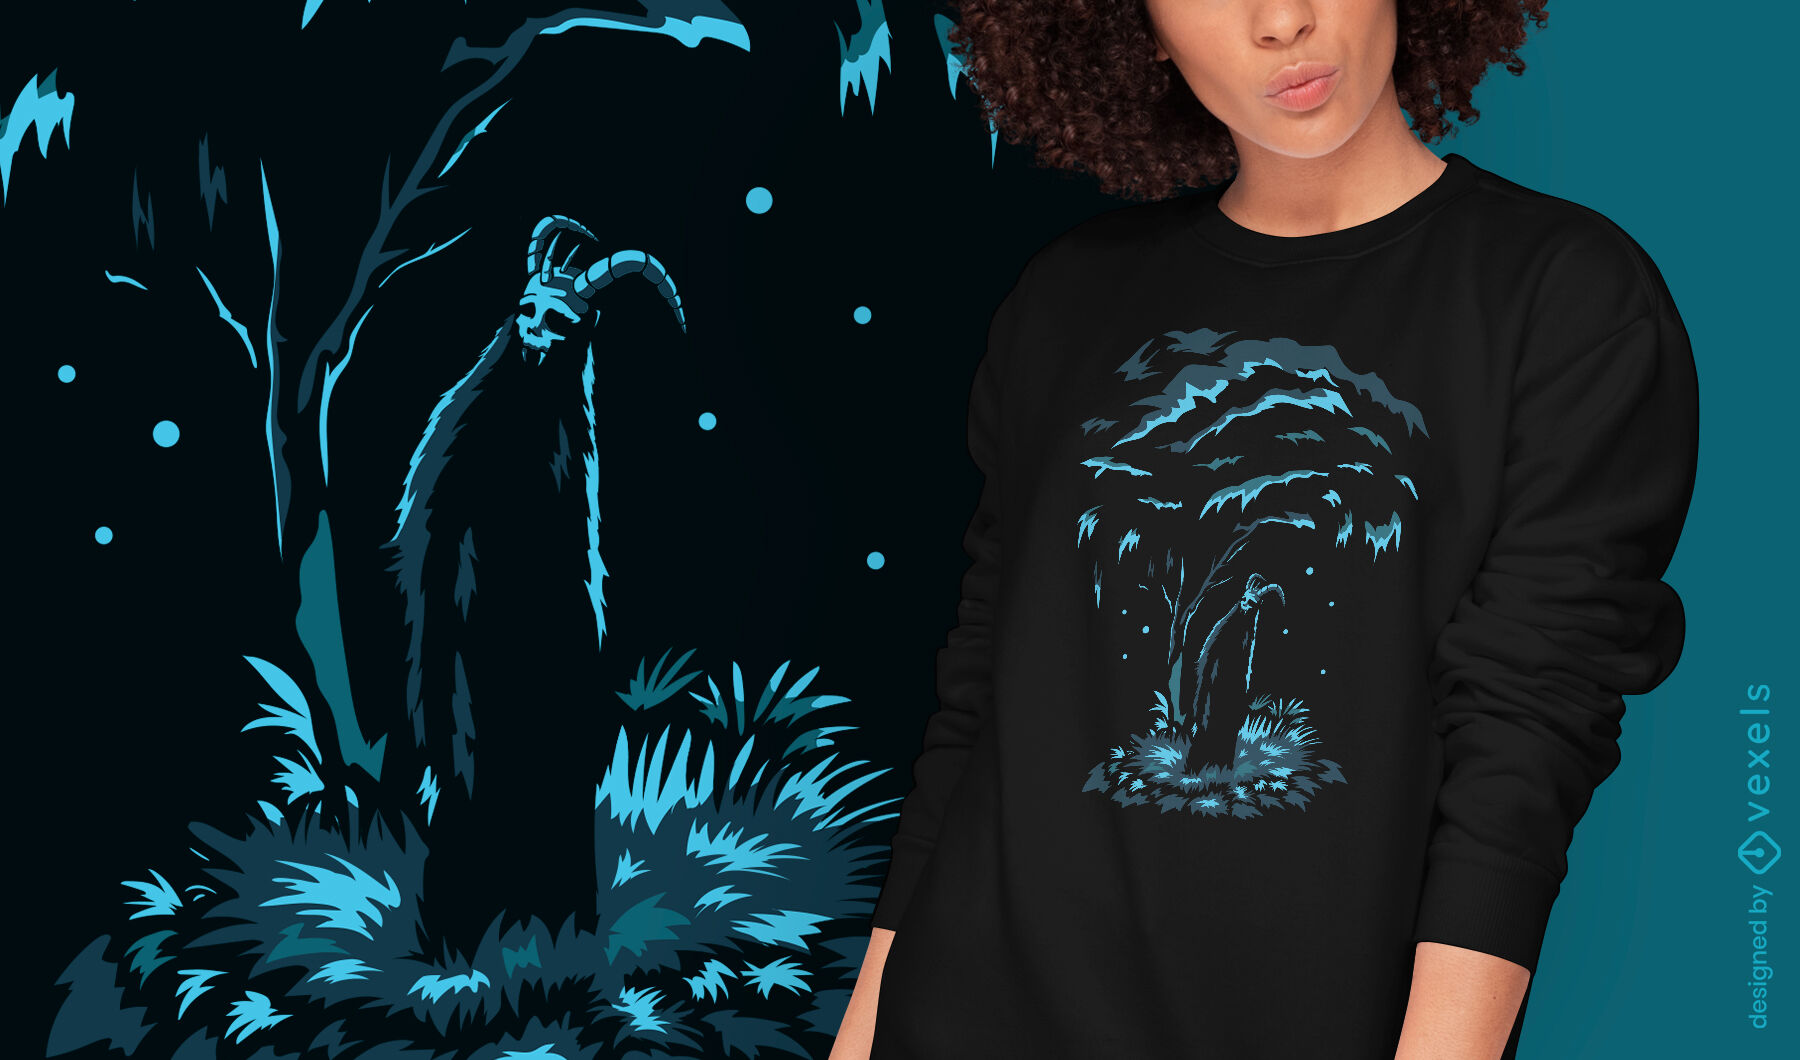 Dark creature nature demon t-shirt design